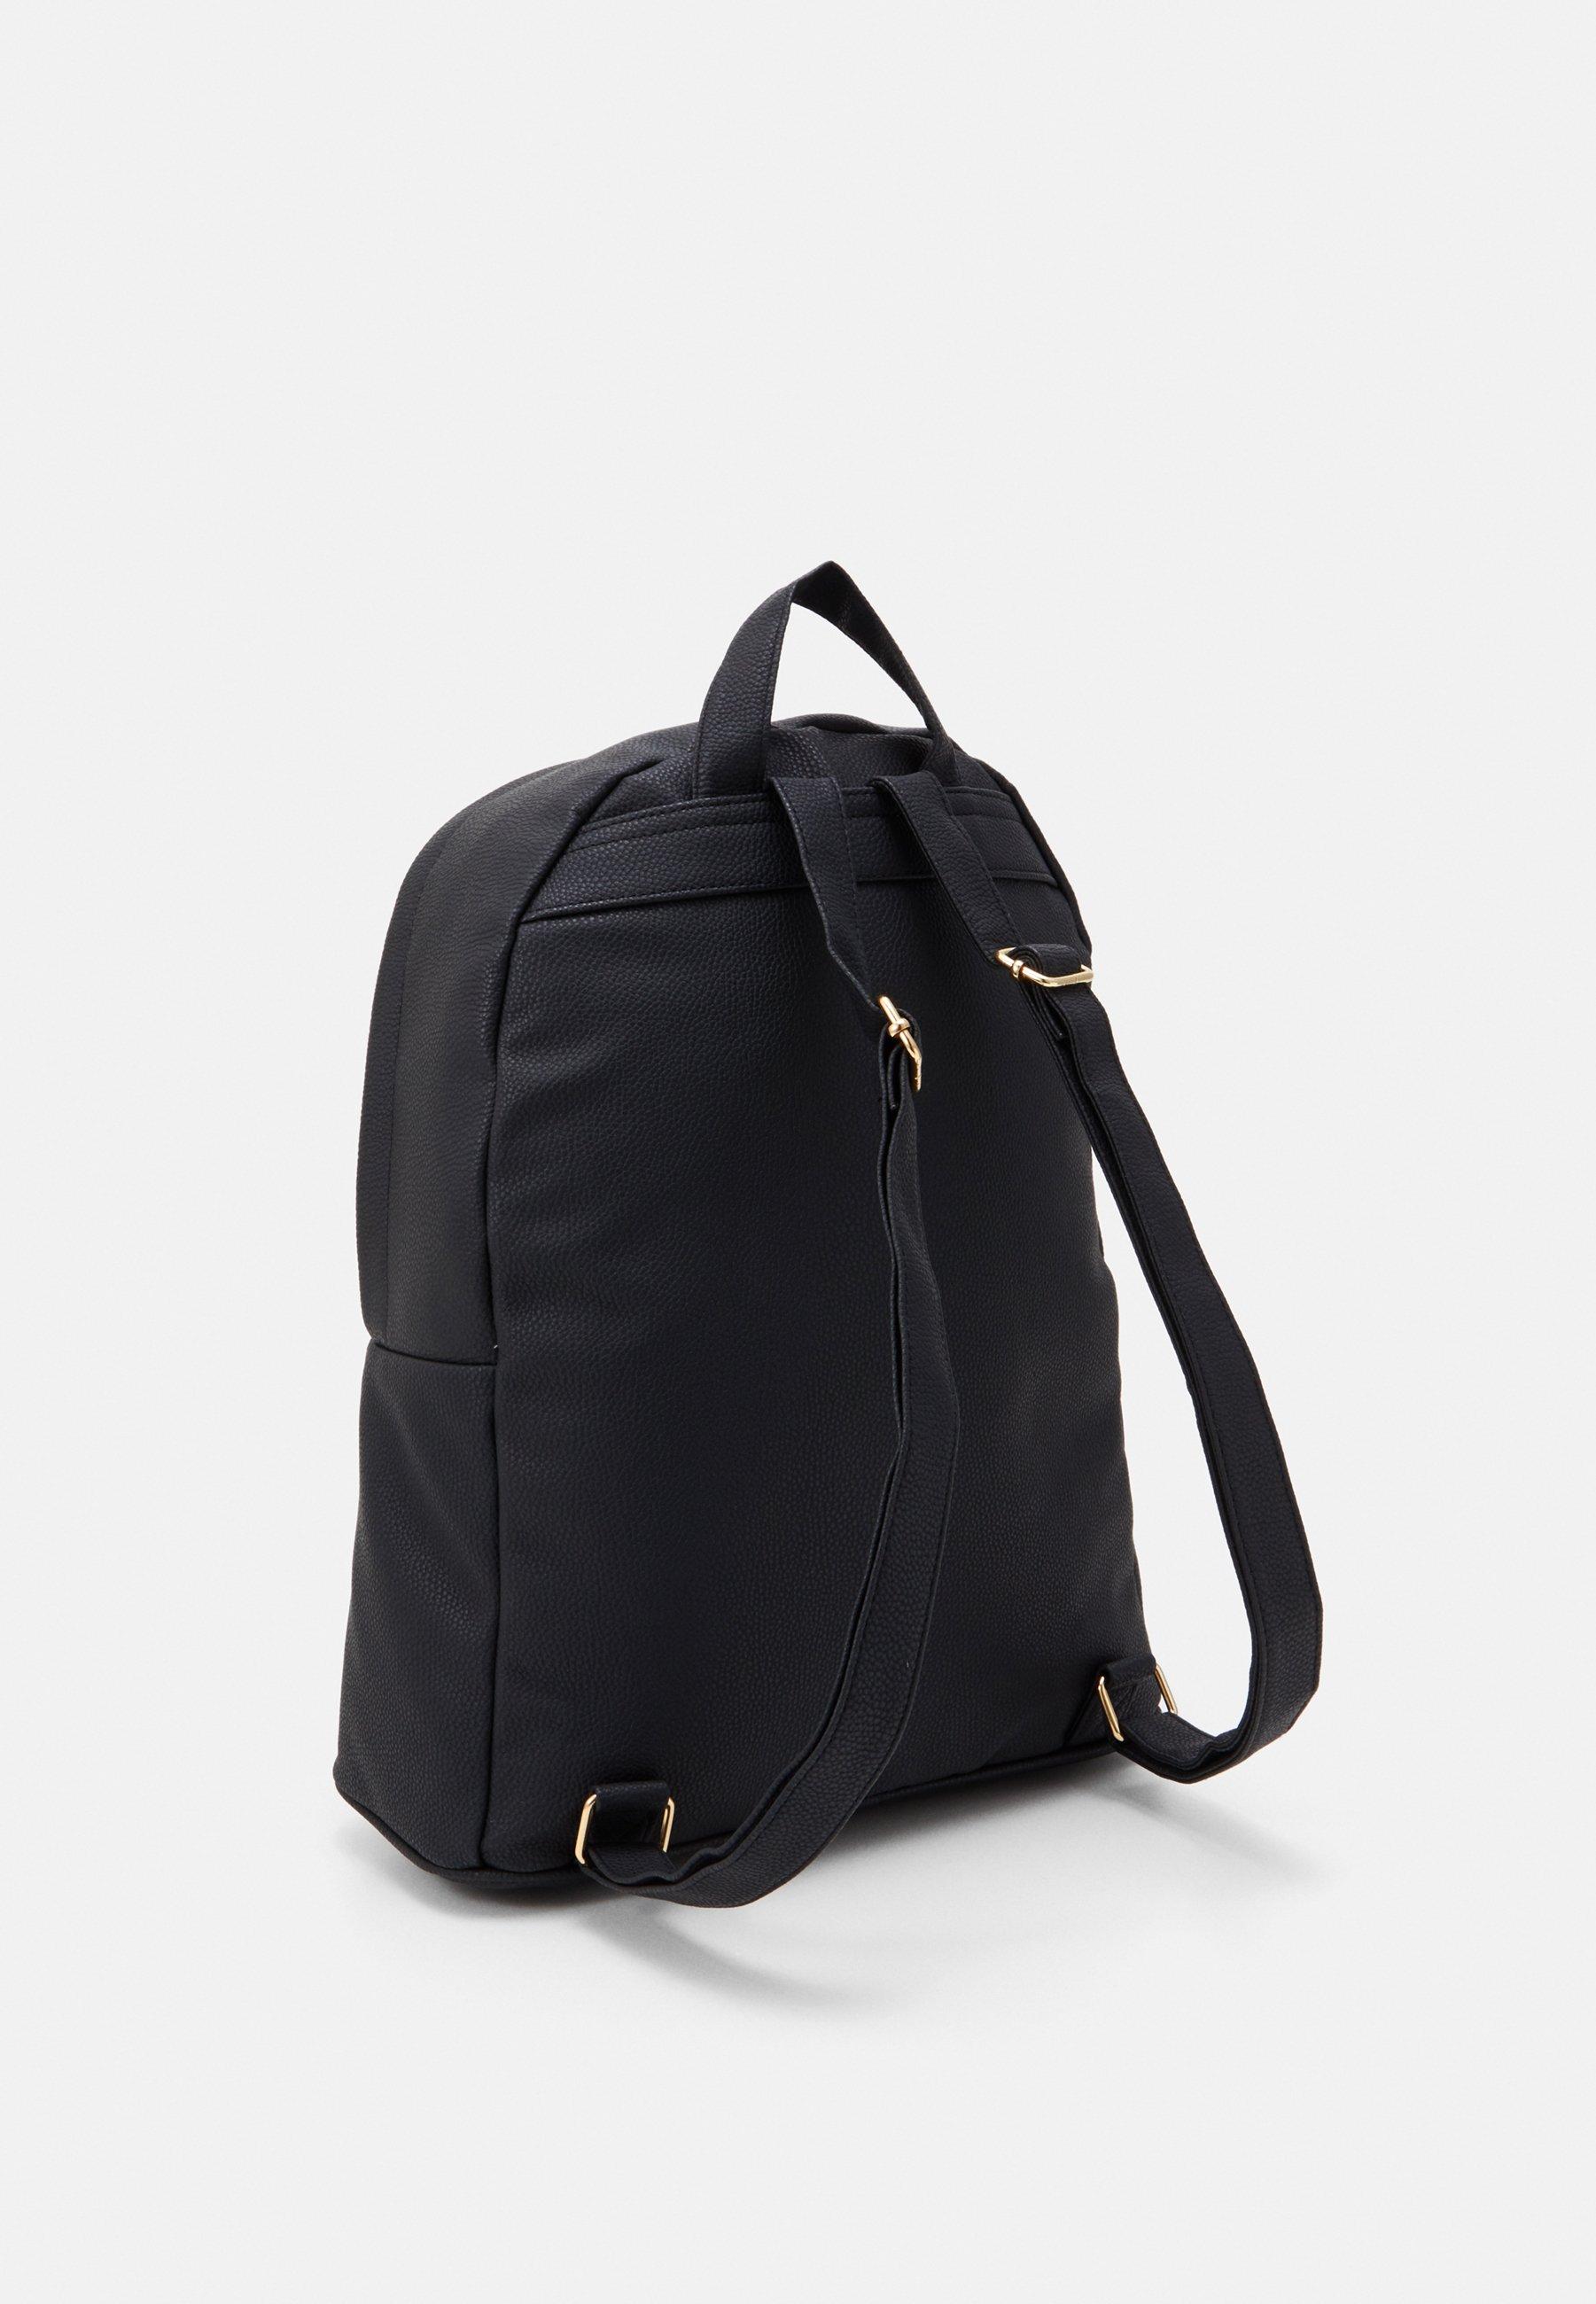 New Look Clive Zip Around Backpack - Tagesrucksack Black/schwarz